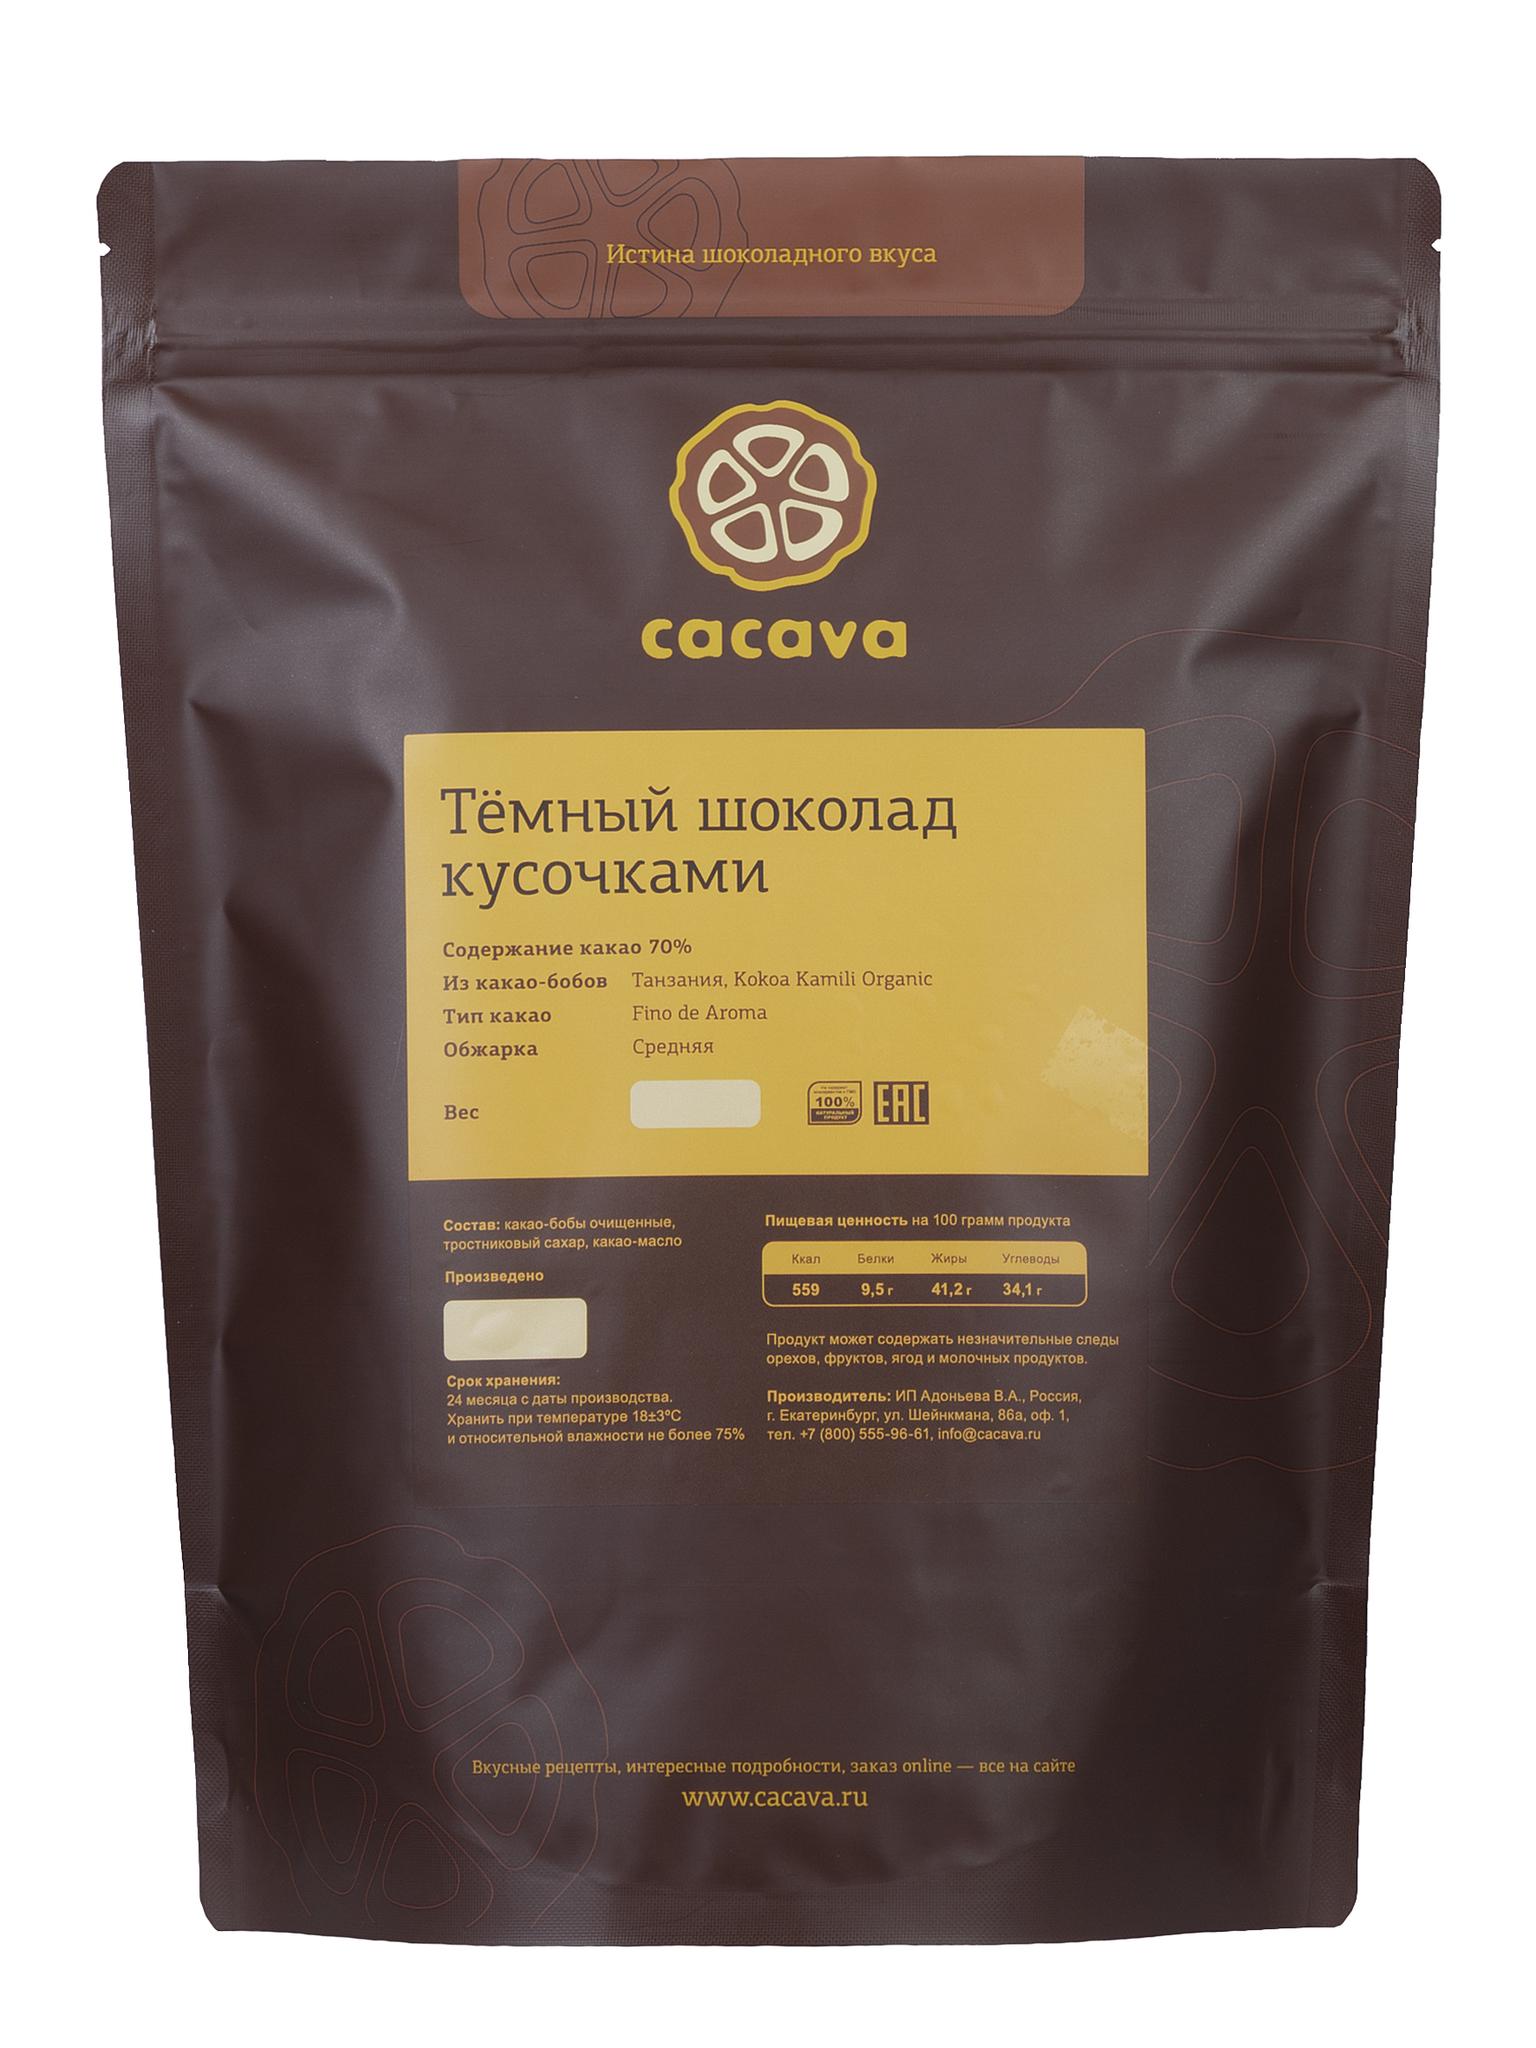 Тёмный шоколад 70 % какао (Танзания, Kokoa Kamili), упаковка 1 кг